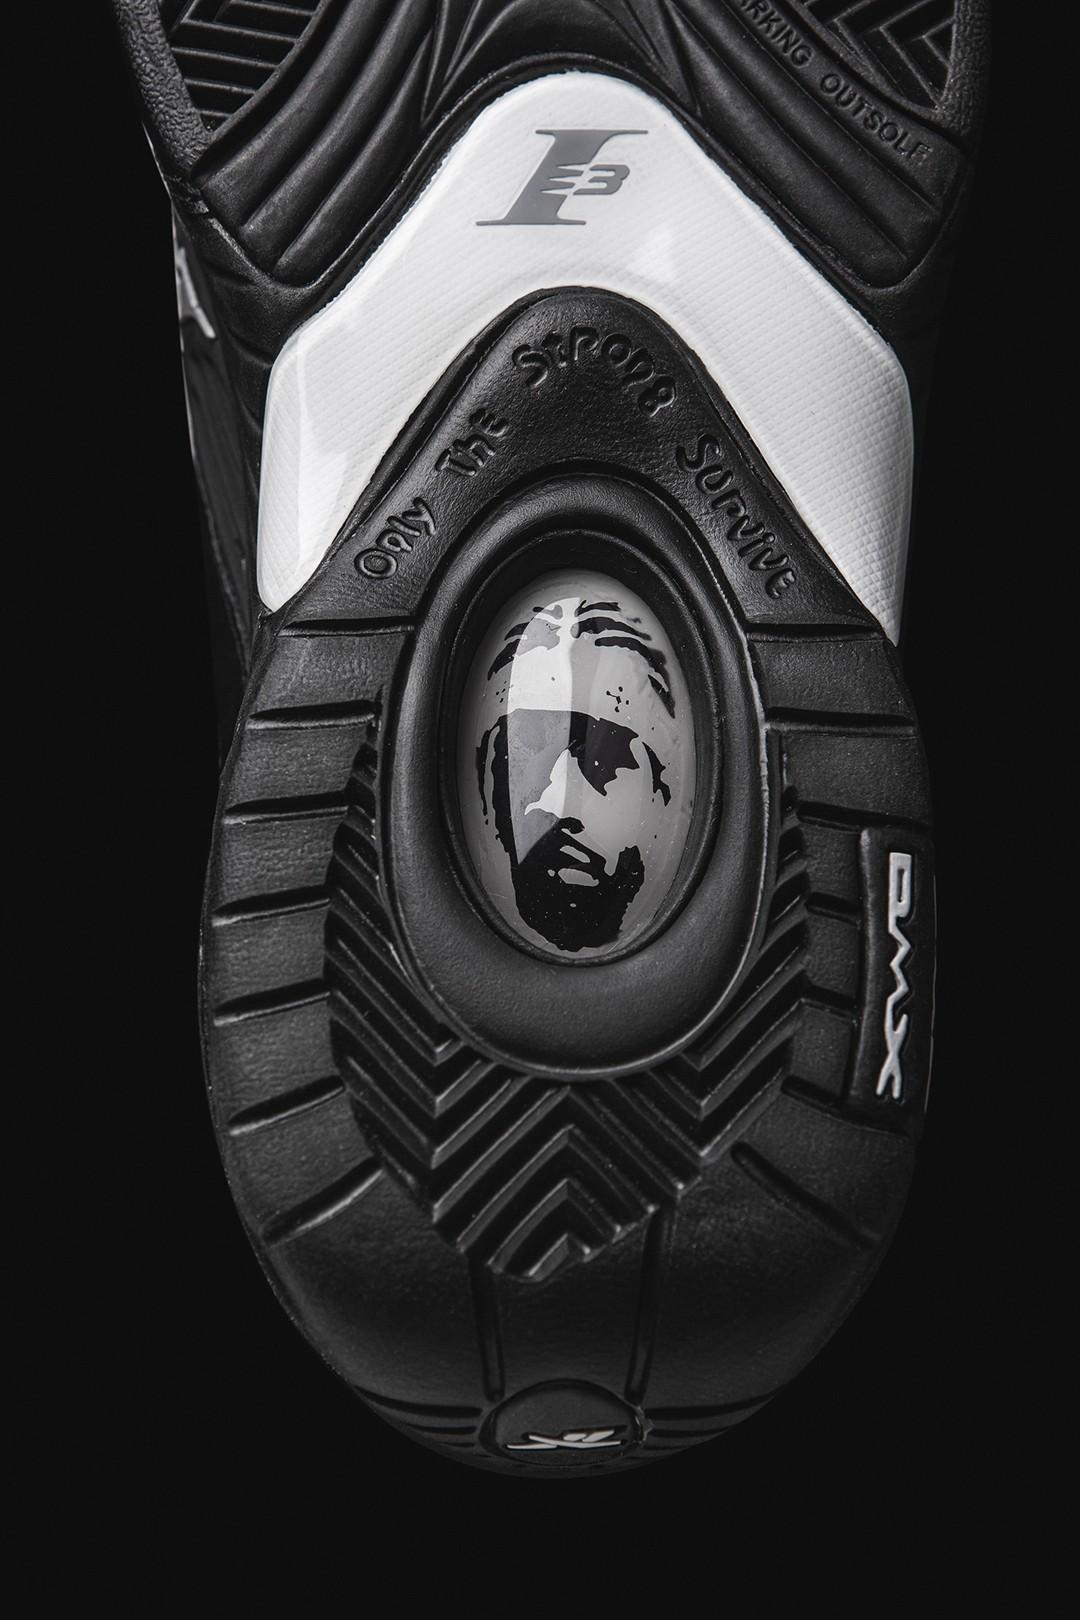 Reebok,Answer IV  见证那个男人的名场面!失踪 4 年的「熊猫球鞋」突发登场!